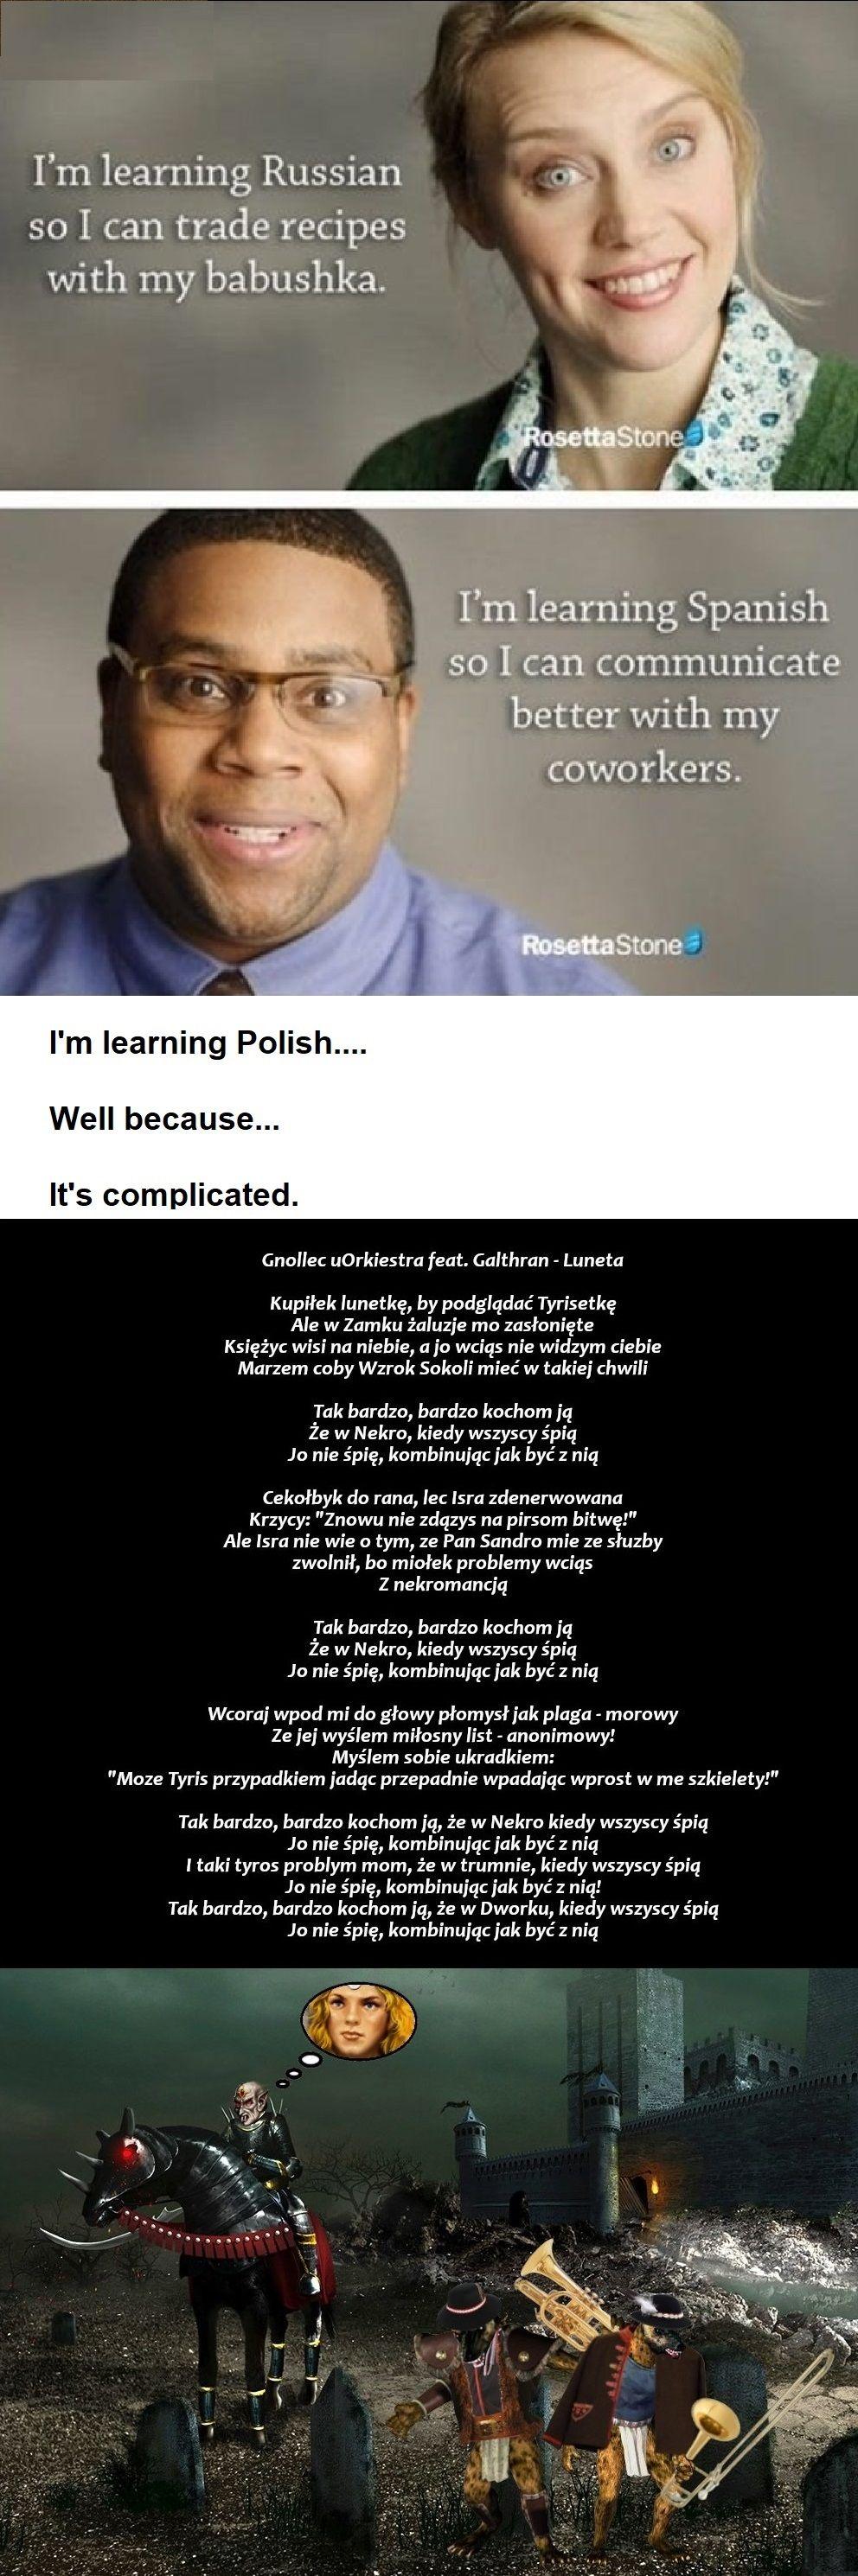 Polish Hugelolers pls help ;(